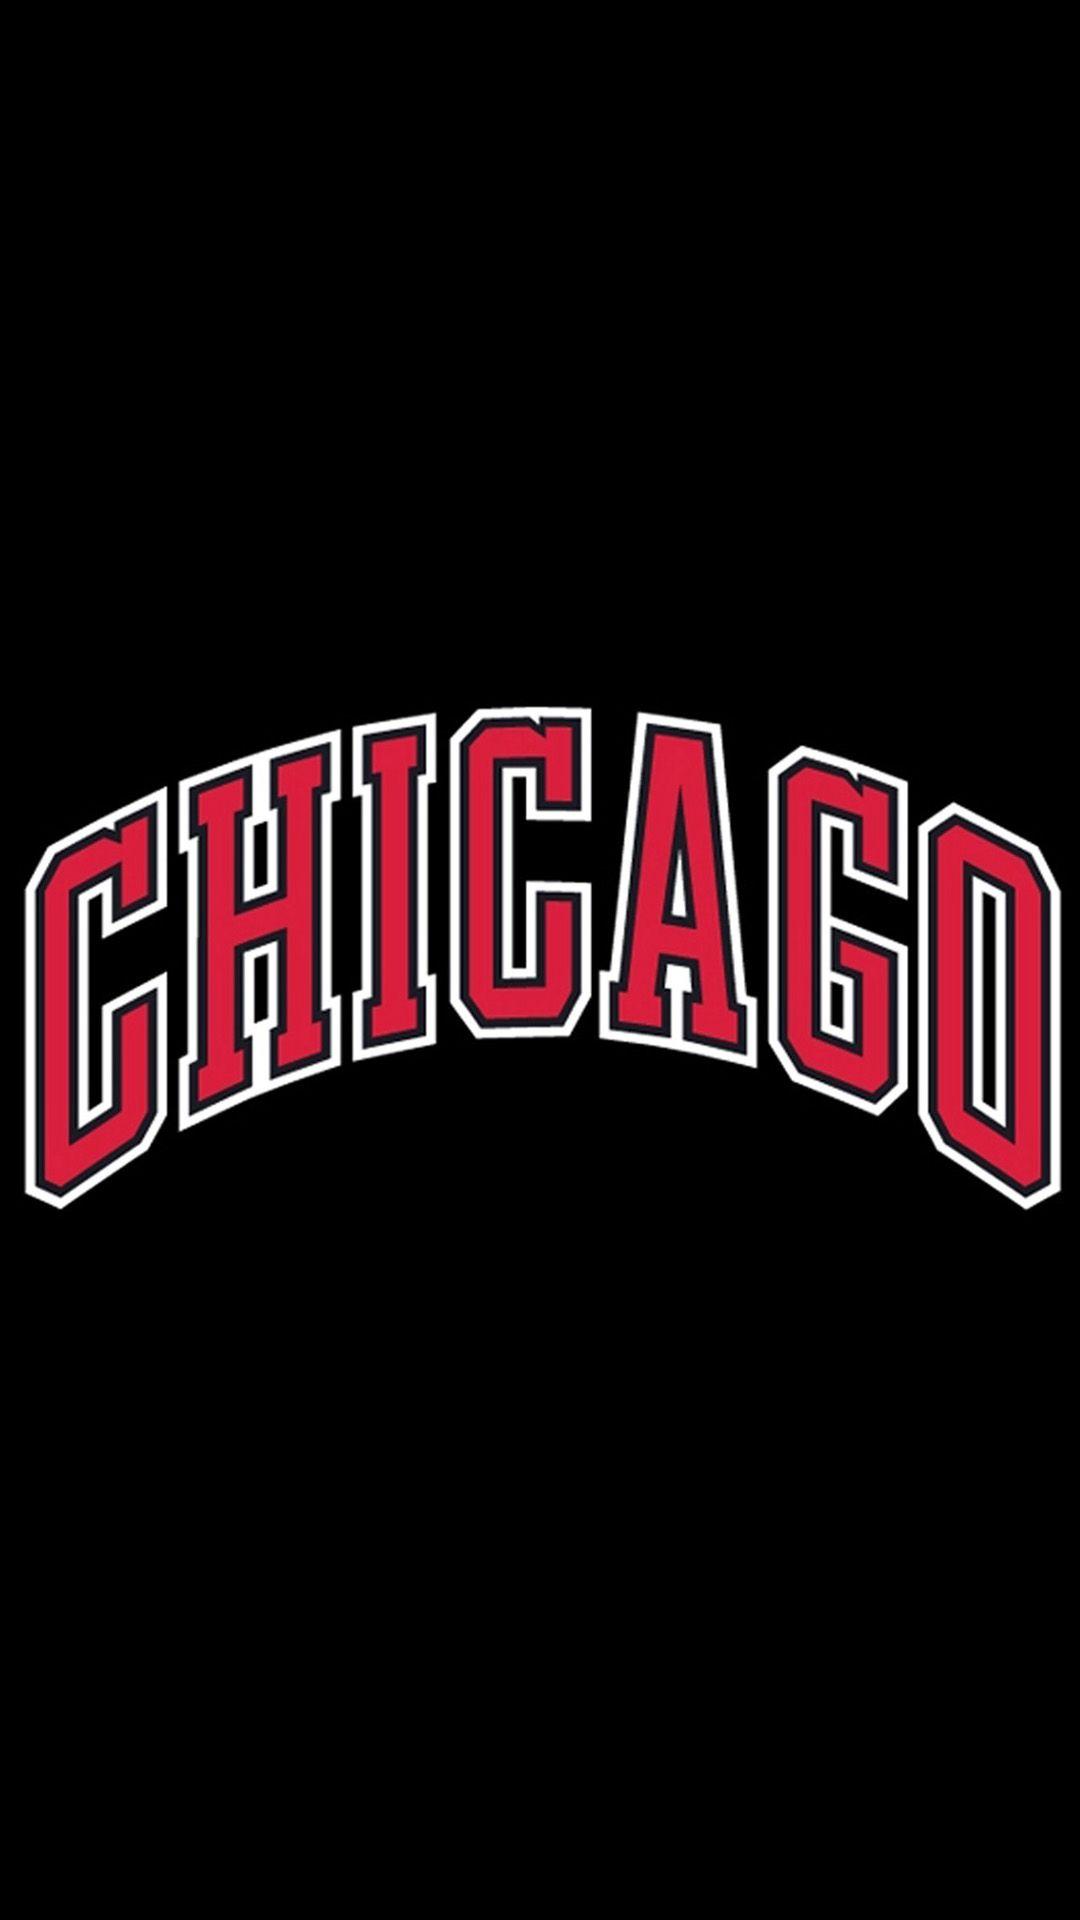 Chicago Bulls Iphone Wallpaper Jordan Logo Android